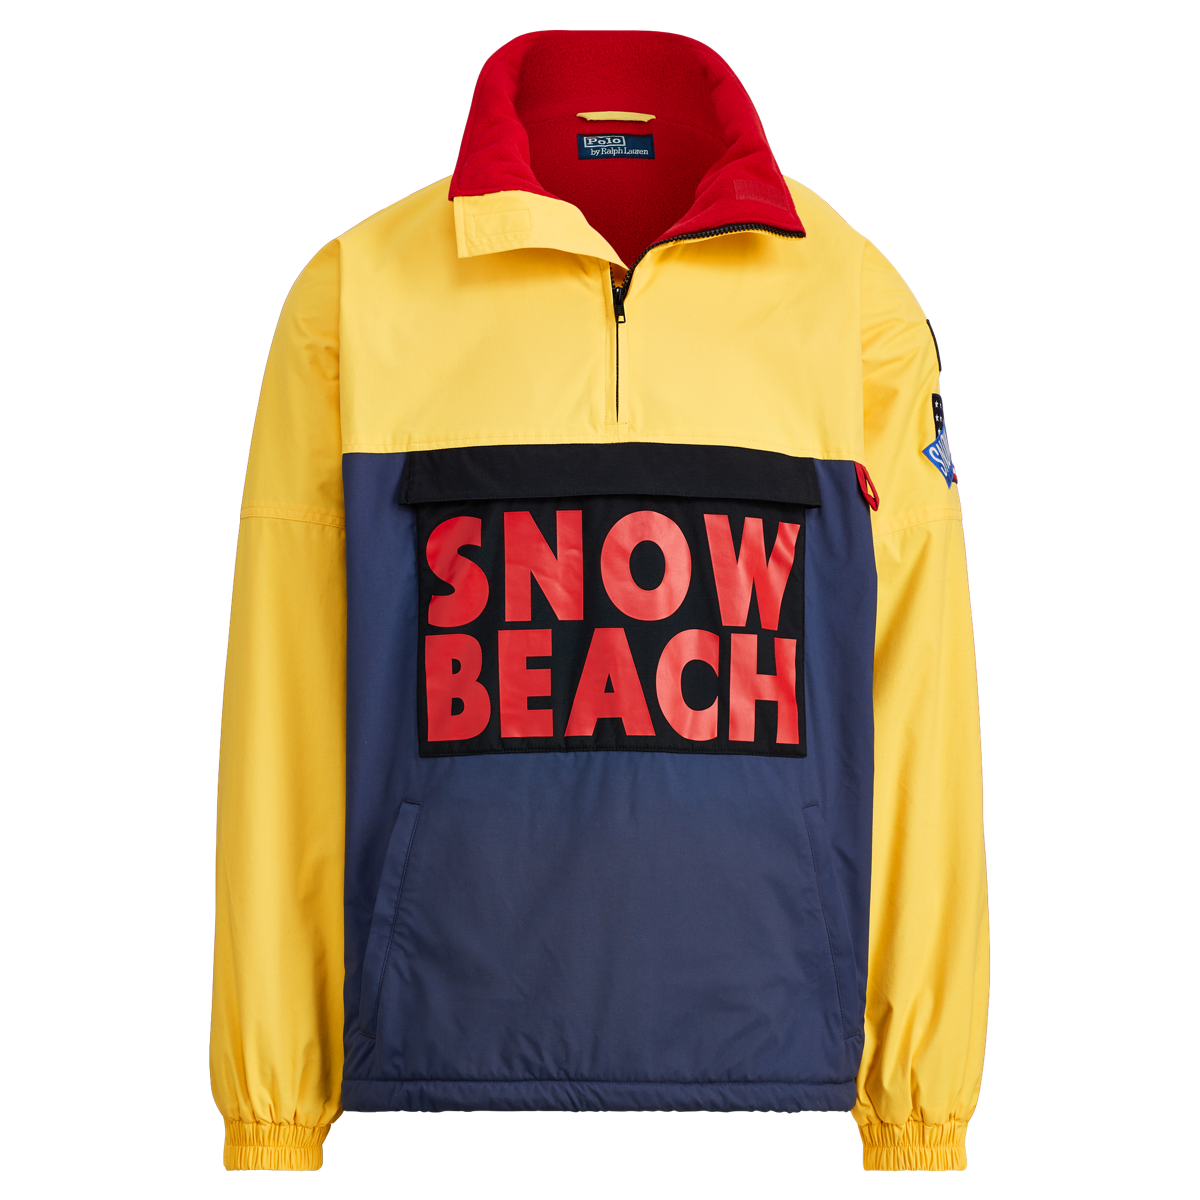 5f7c9c4a12 Snow Beach Pullover